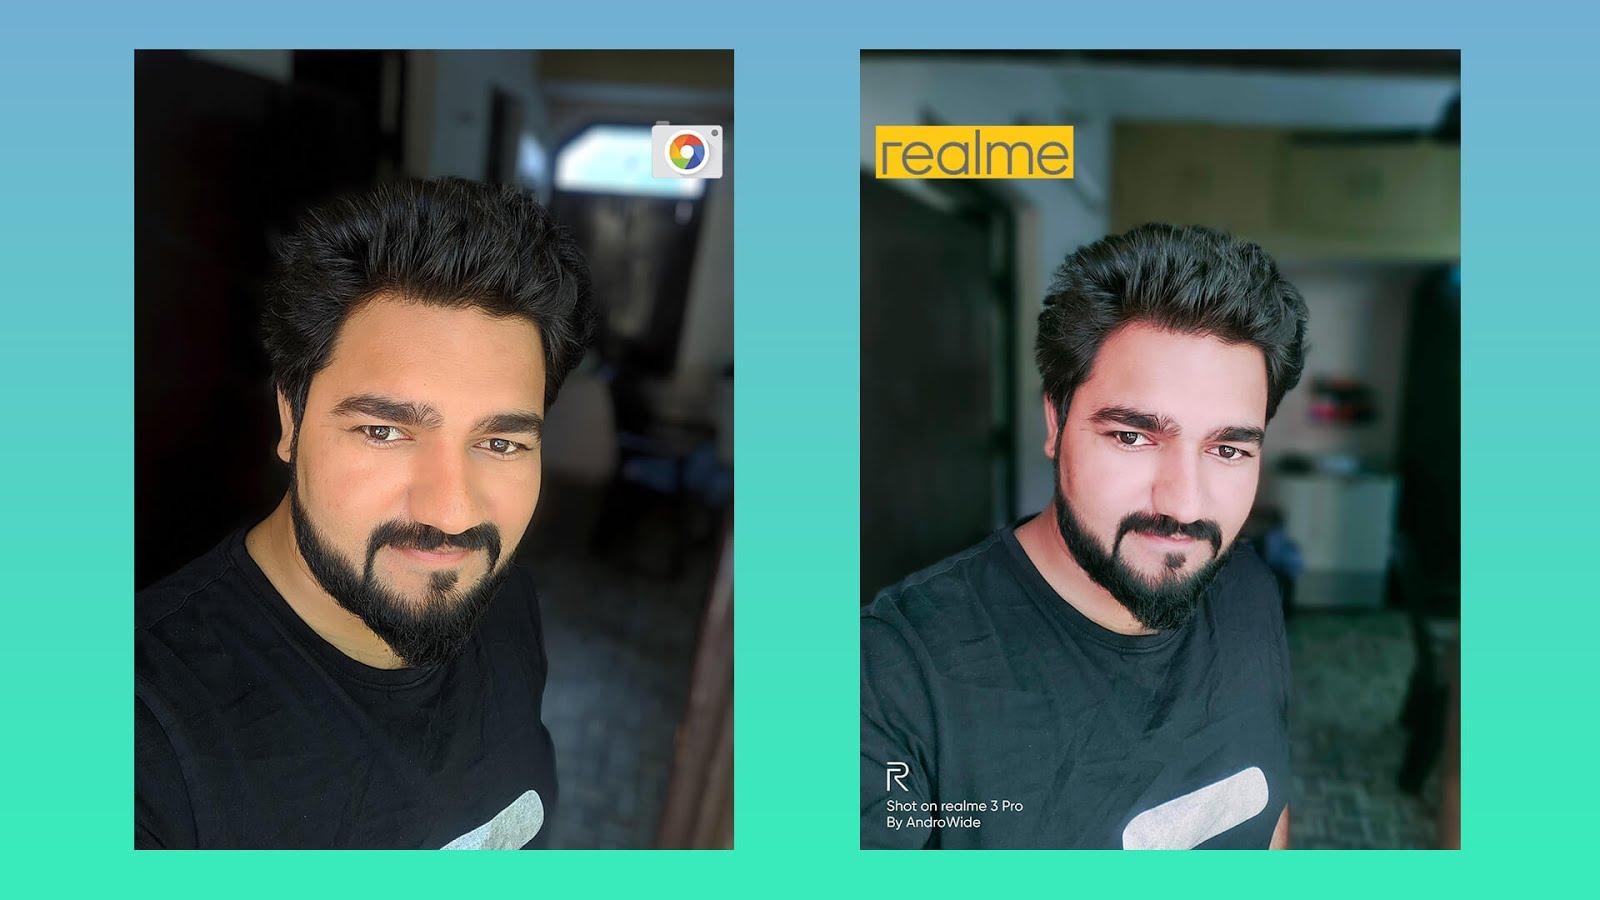 How to Use Google Camera on RealMe 3 PRO, GCam For RealMe 3